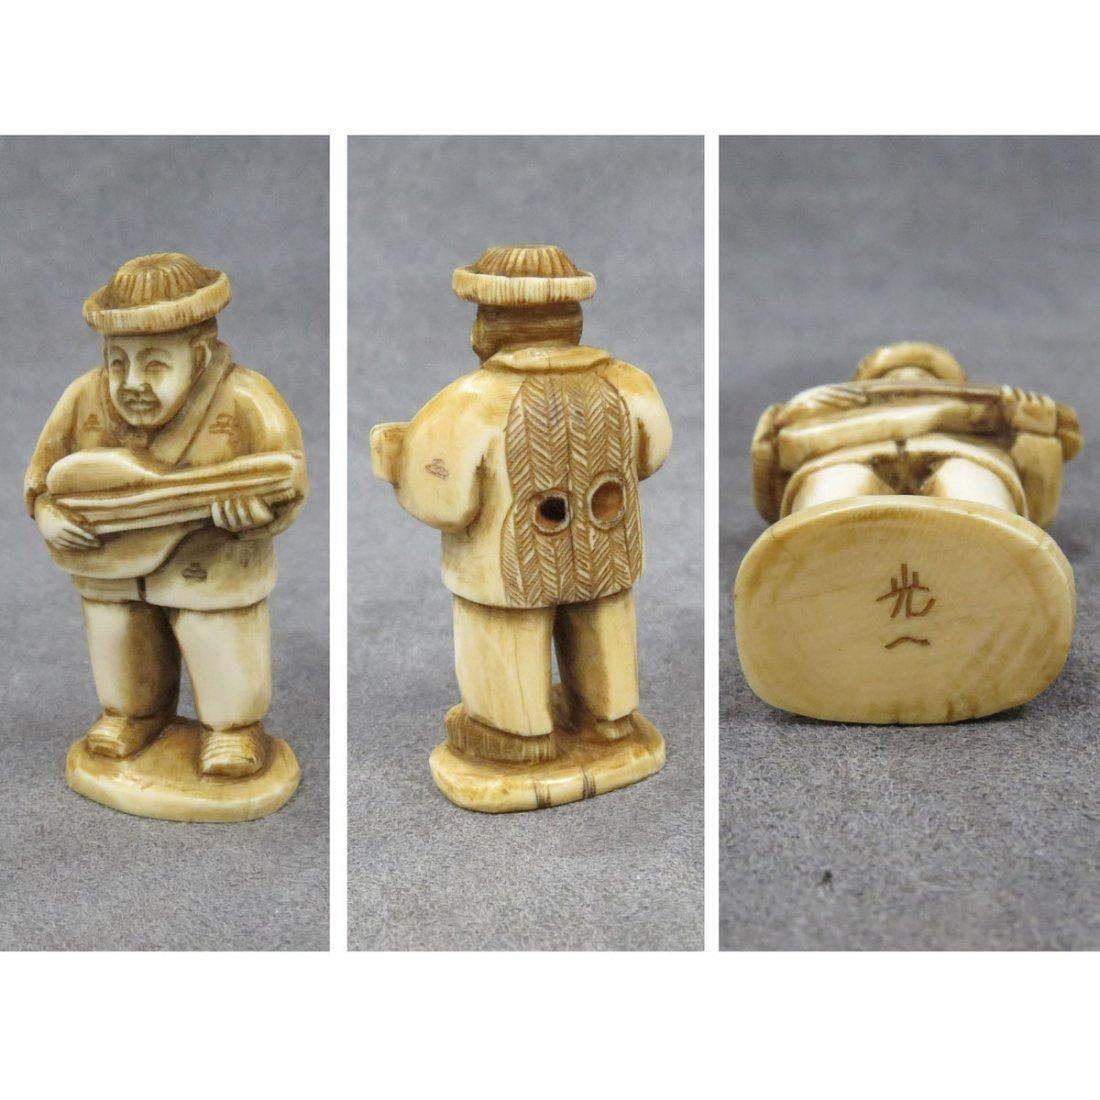 JAPANESE CARVED IVORY NETSUKE, MUSICIAN, SIGNED